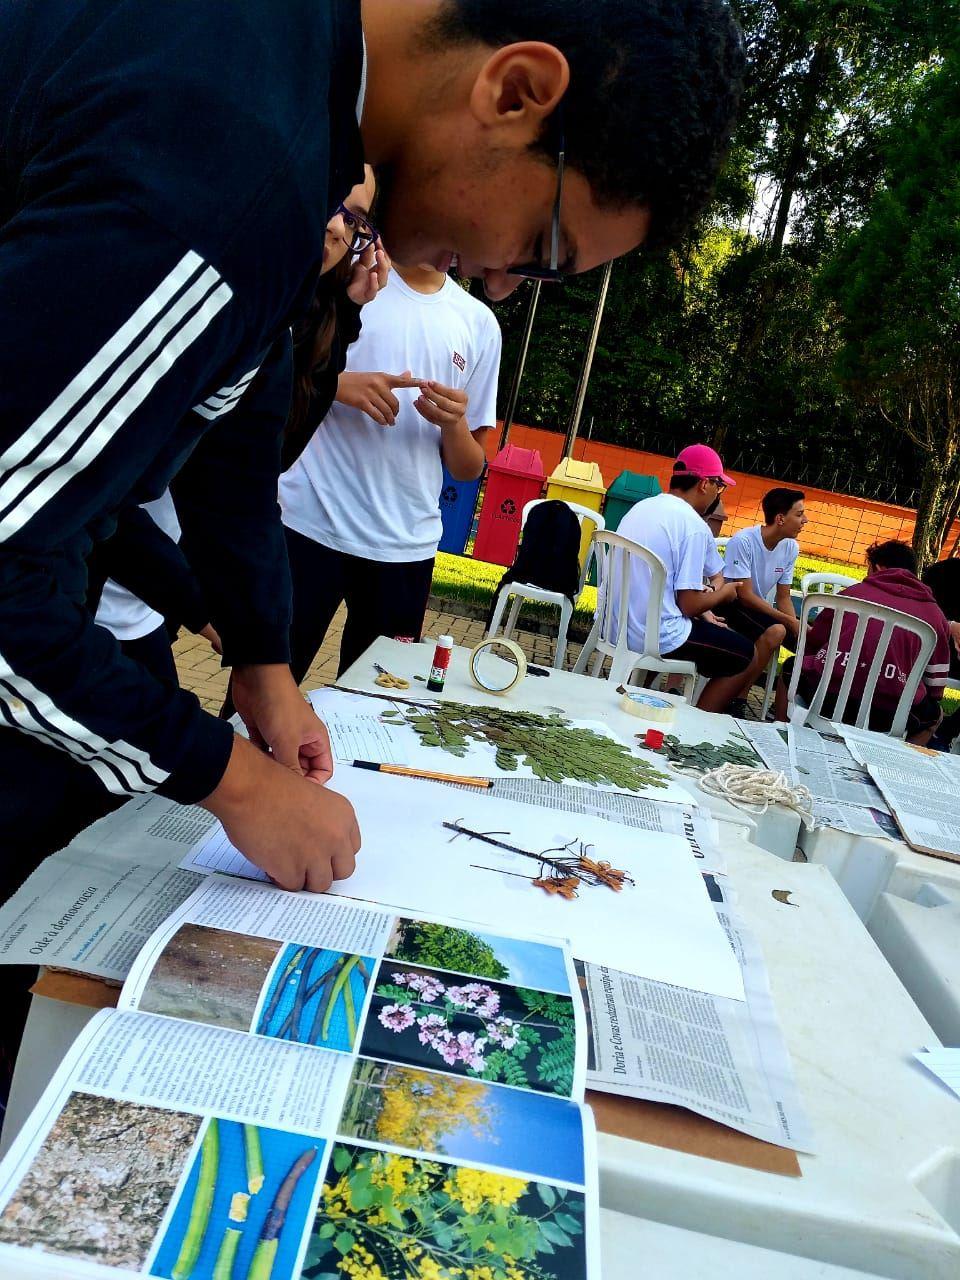 Alunos do SESI de Santa Bárbara catalogam espécies de árvores